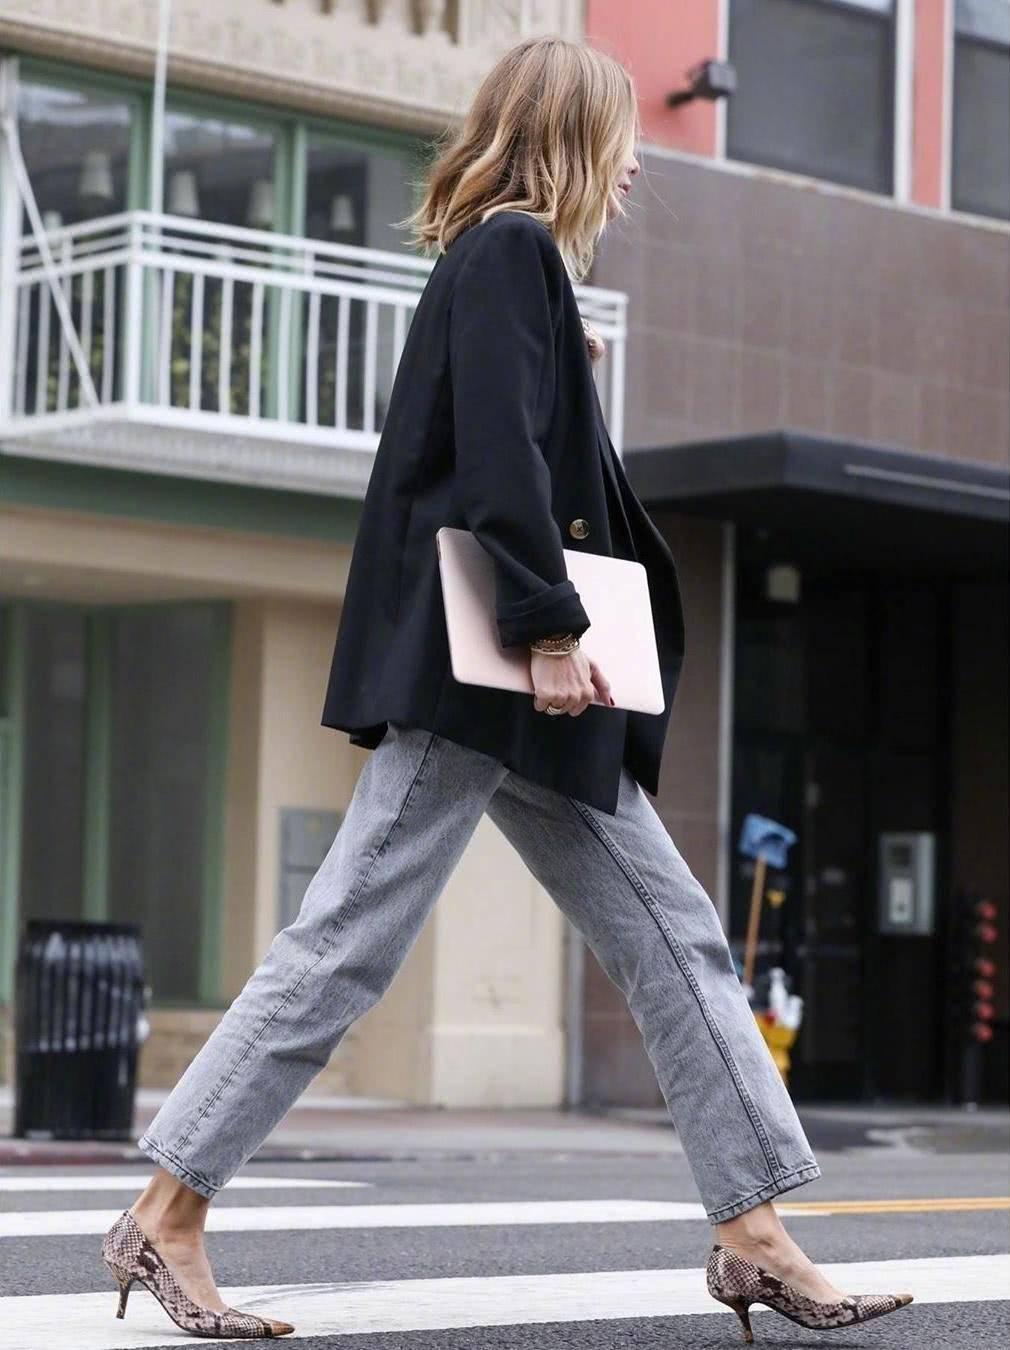 <b>春季牛仔裤的时髦穿搭法,显瘦又高级,女神范儿十足</b>